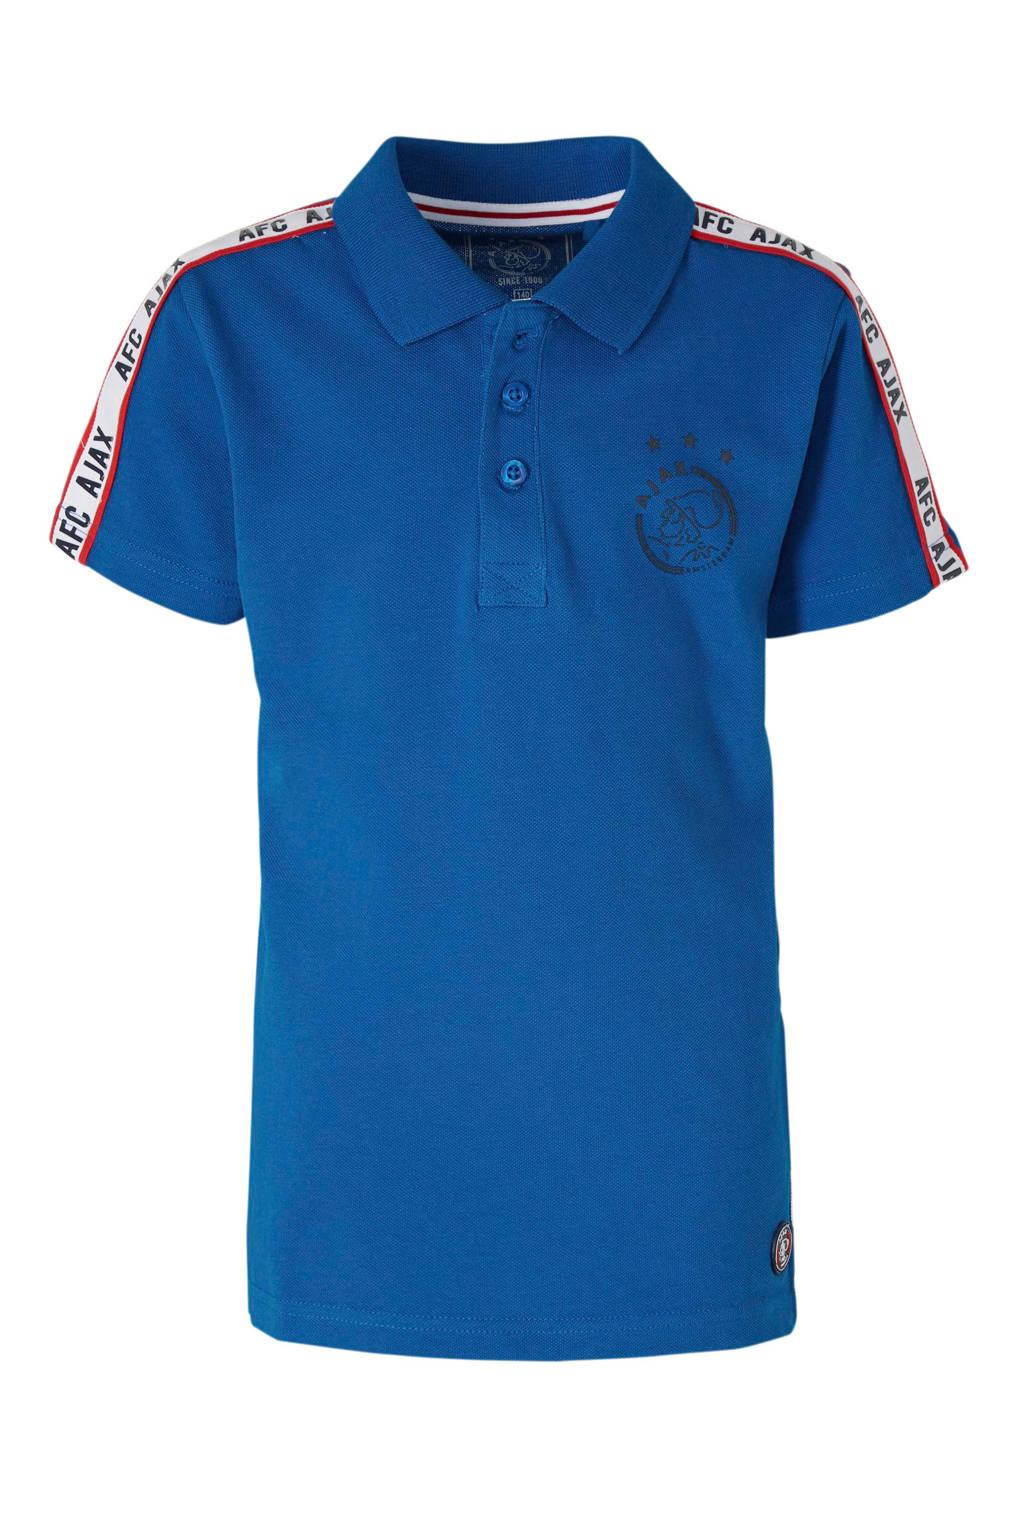 Ajax piqué polo met logo en contrastbies kobaltblauw, Kobaltblauw